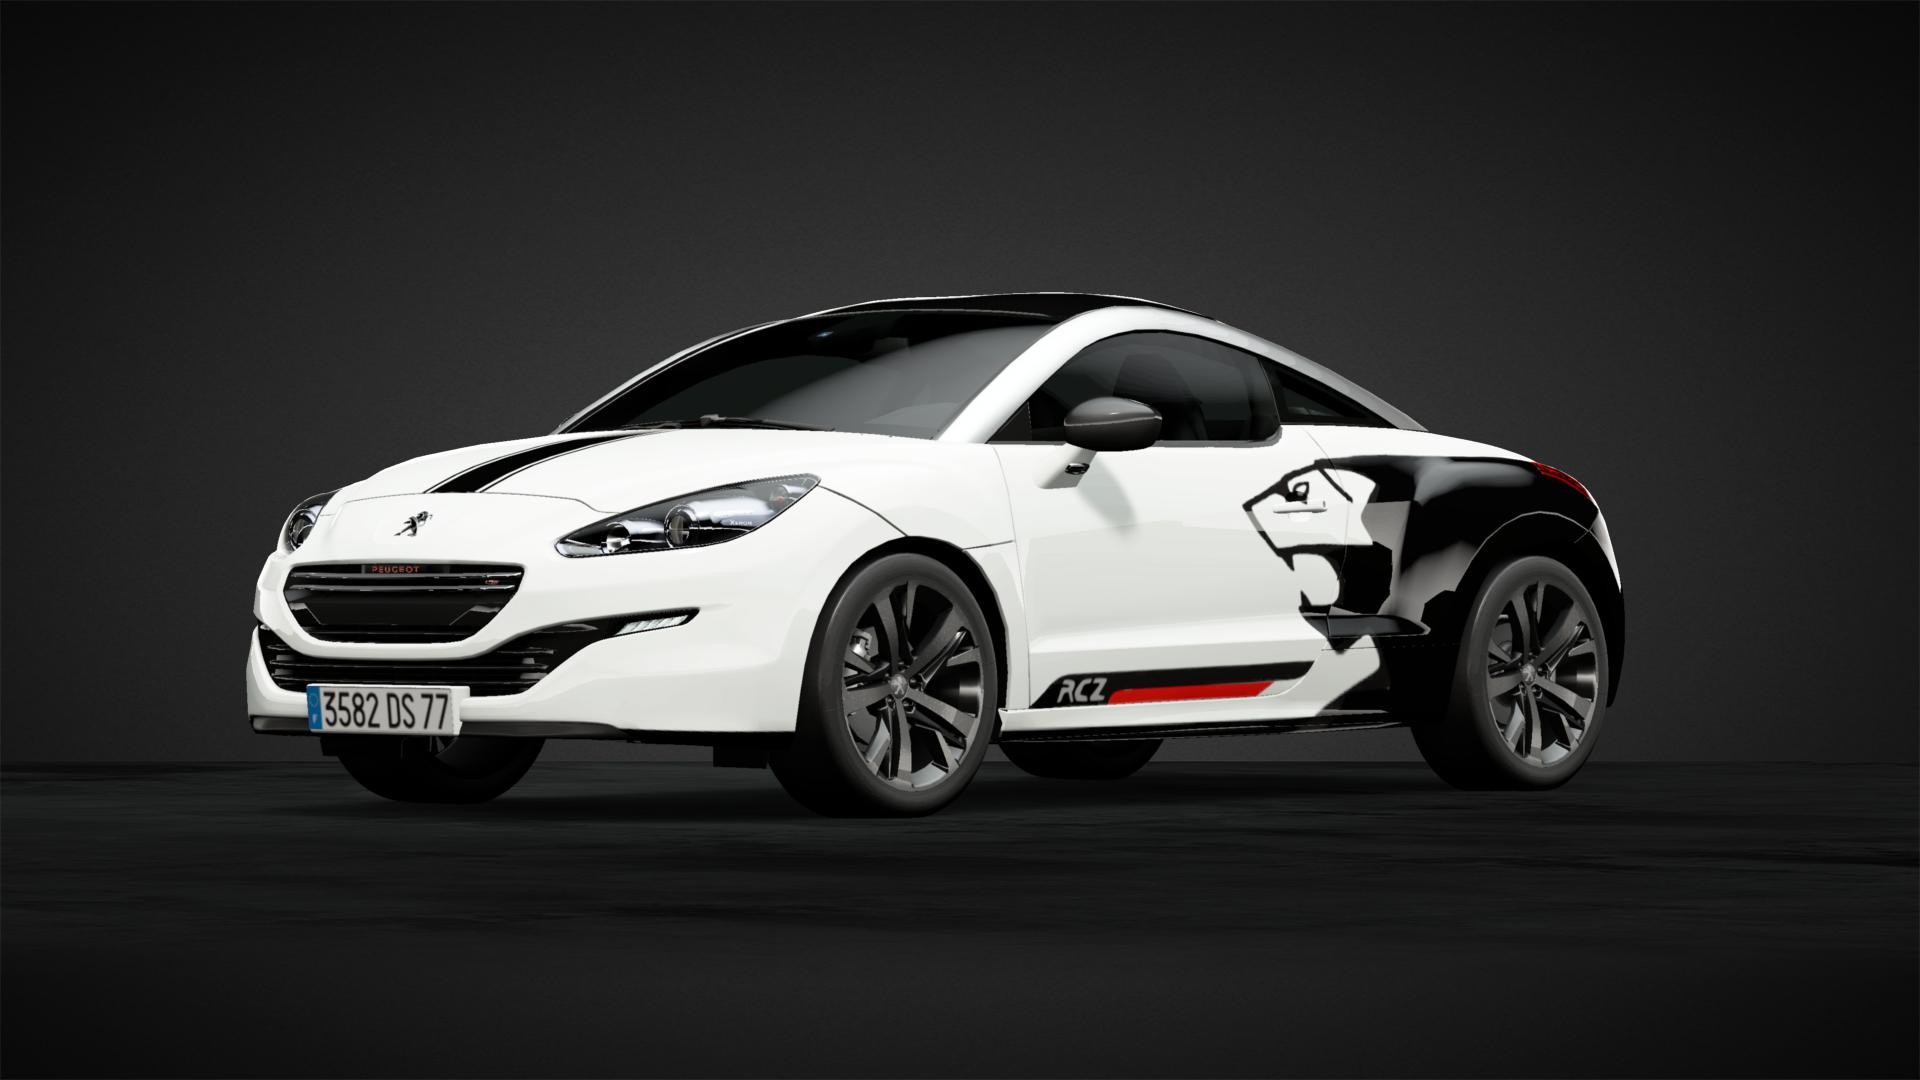 Bailey S Rcz R Wrap Rcz Tuning Car Livery By Quartara007fabio Community Gran Turismo Sport